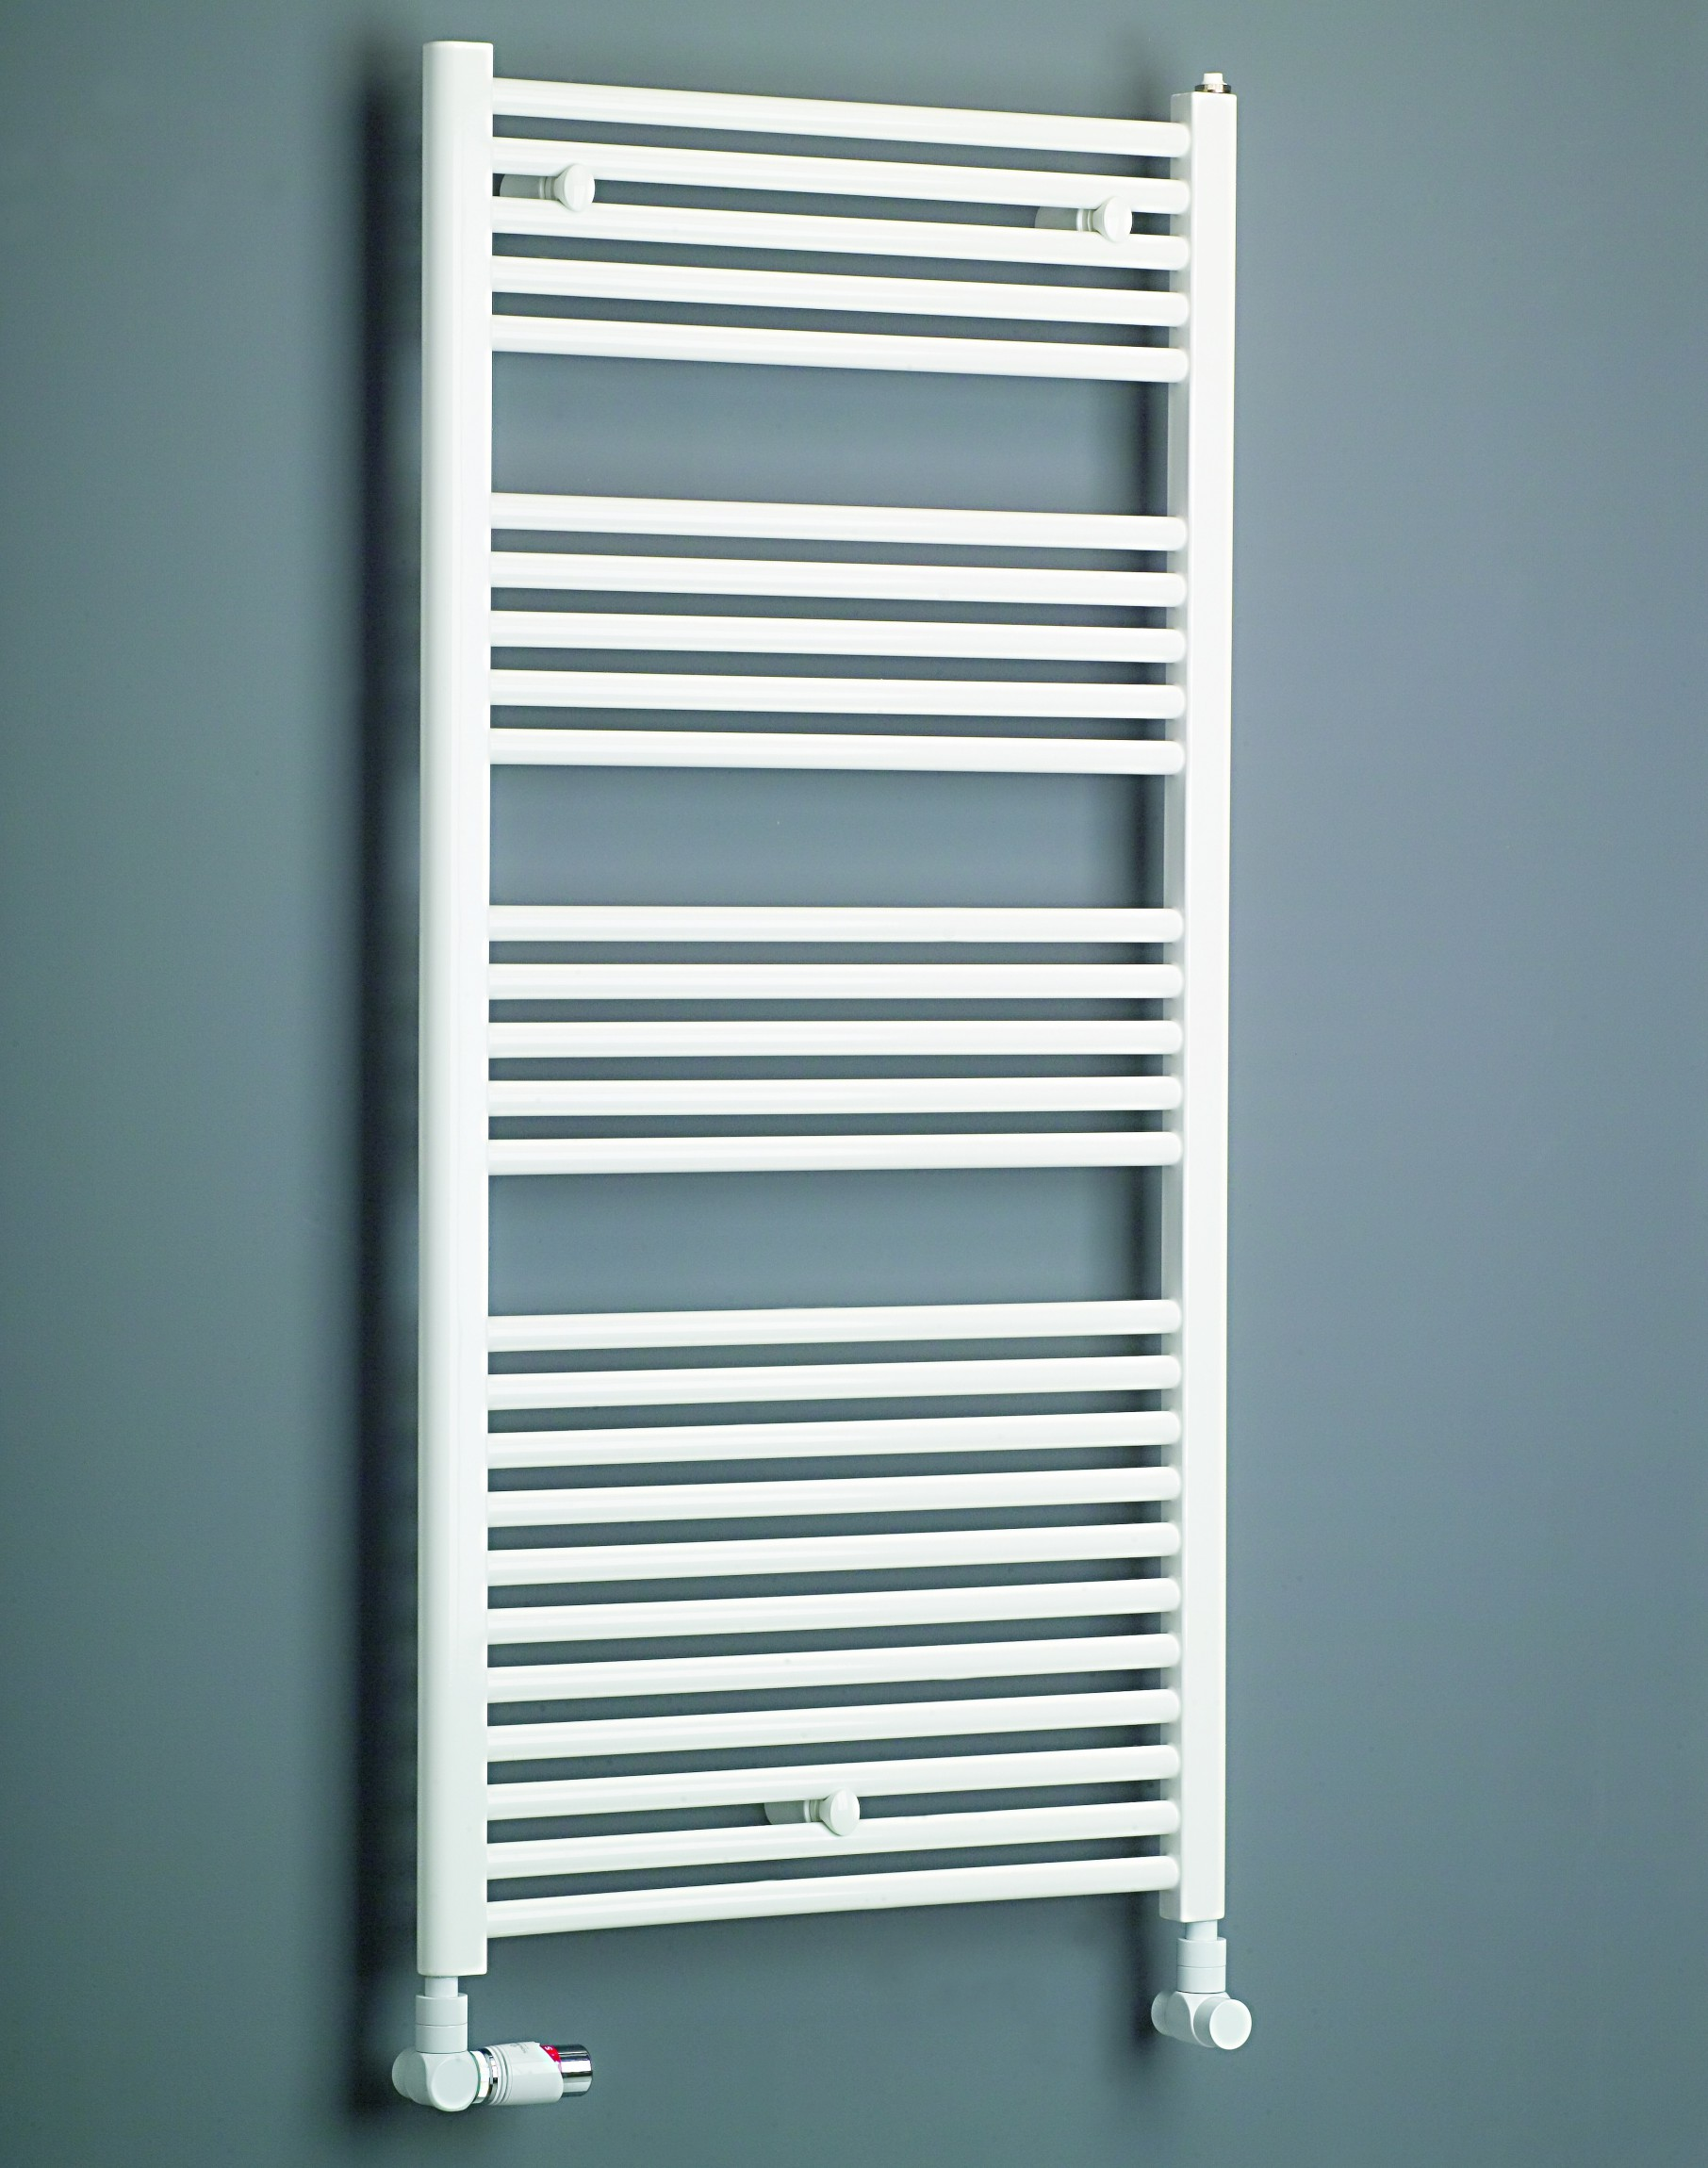 badheizk rper vertikal 1800 x 450 500 600 750 mm breit. Black Bedroom Furniture Sets. Home Design Ideas